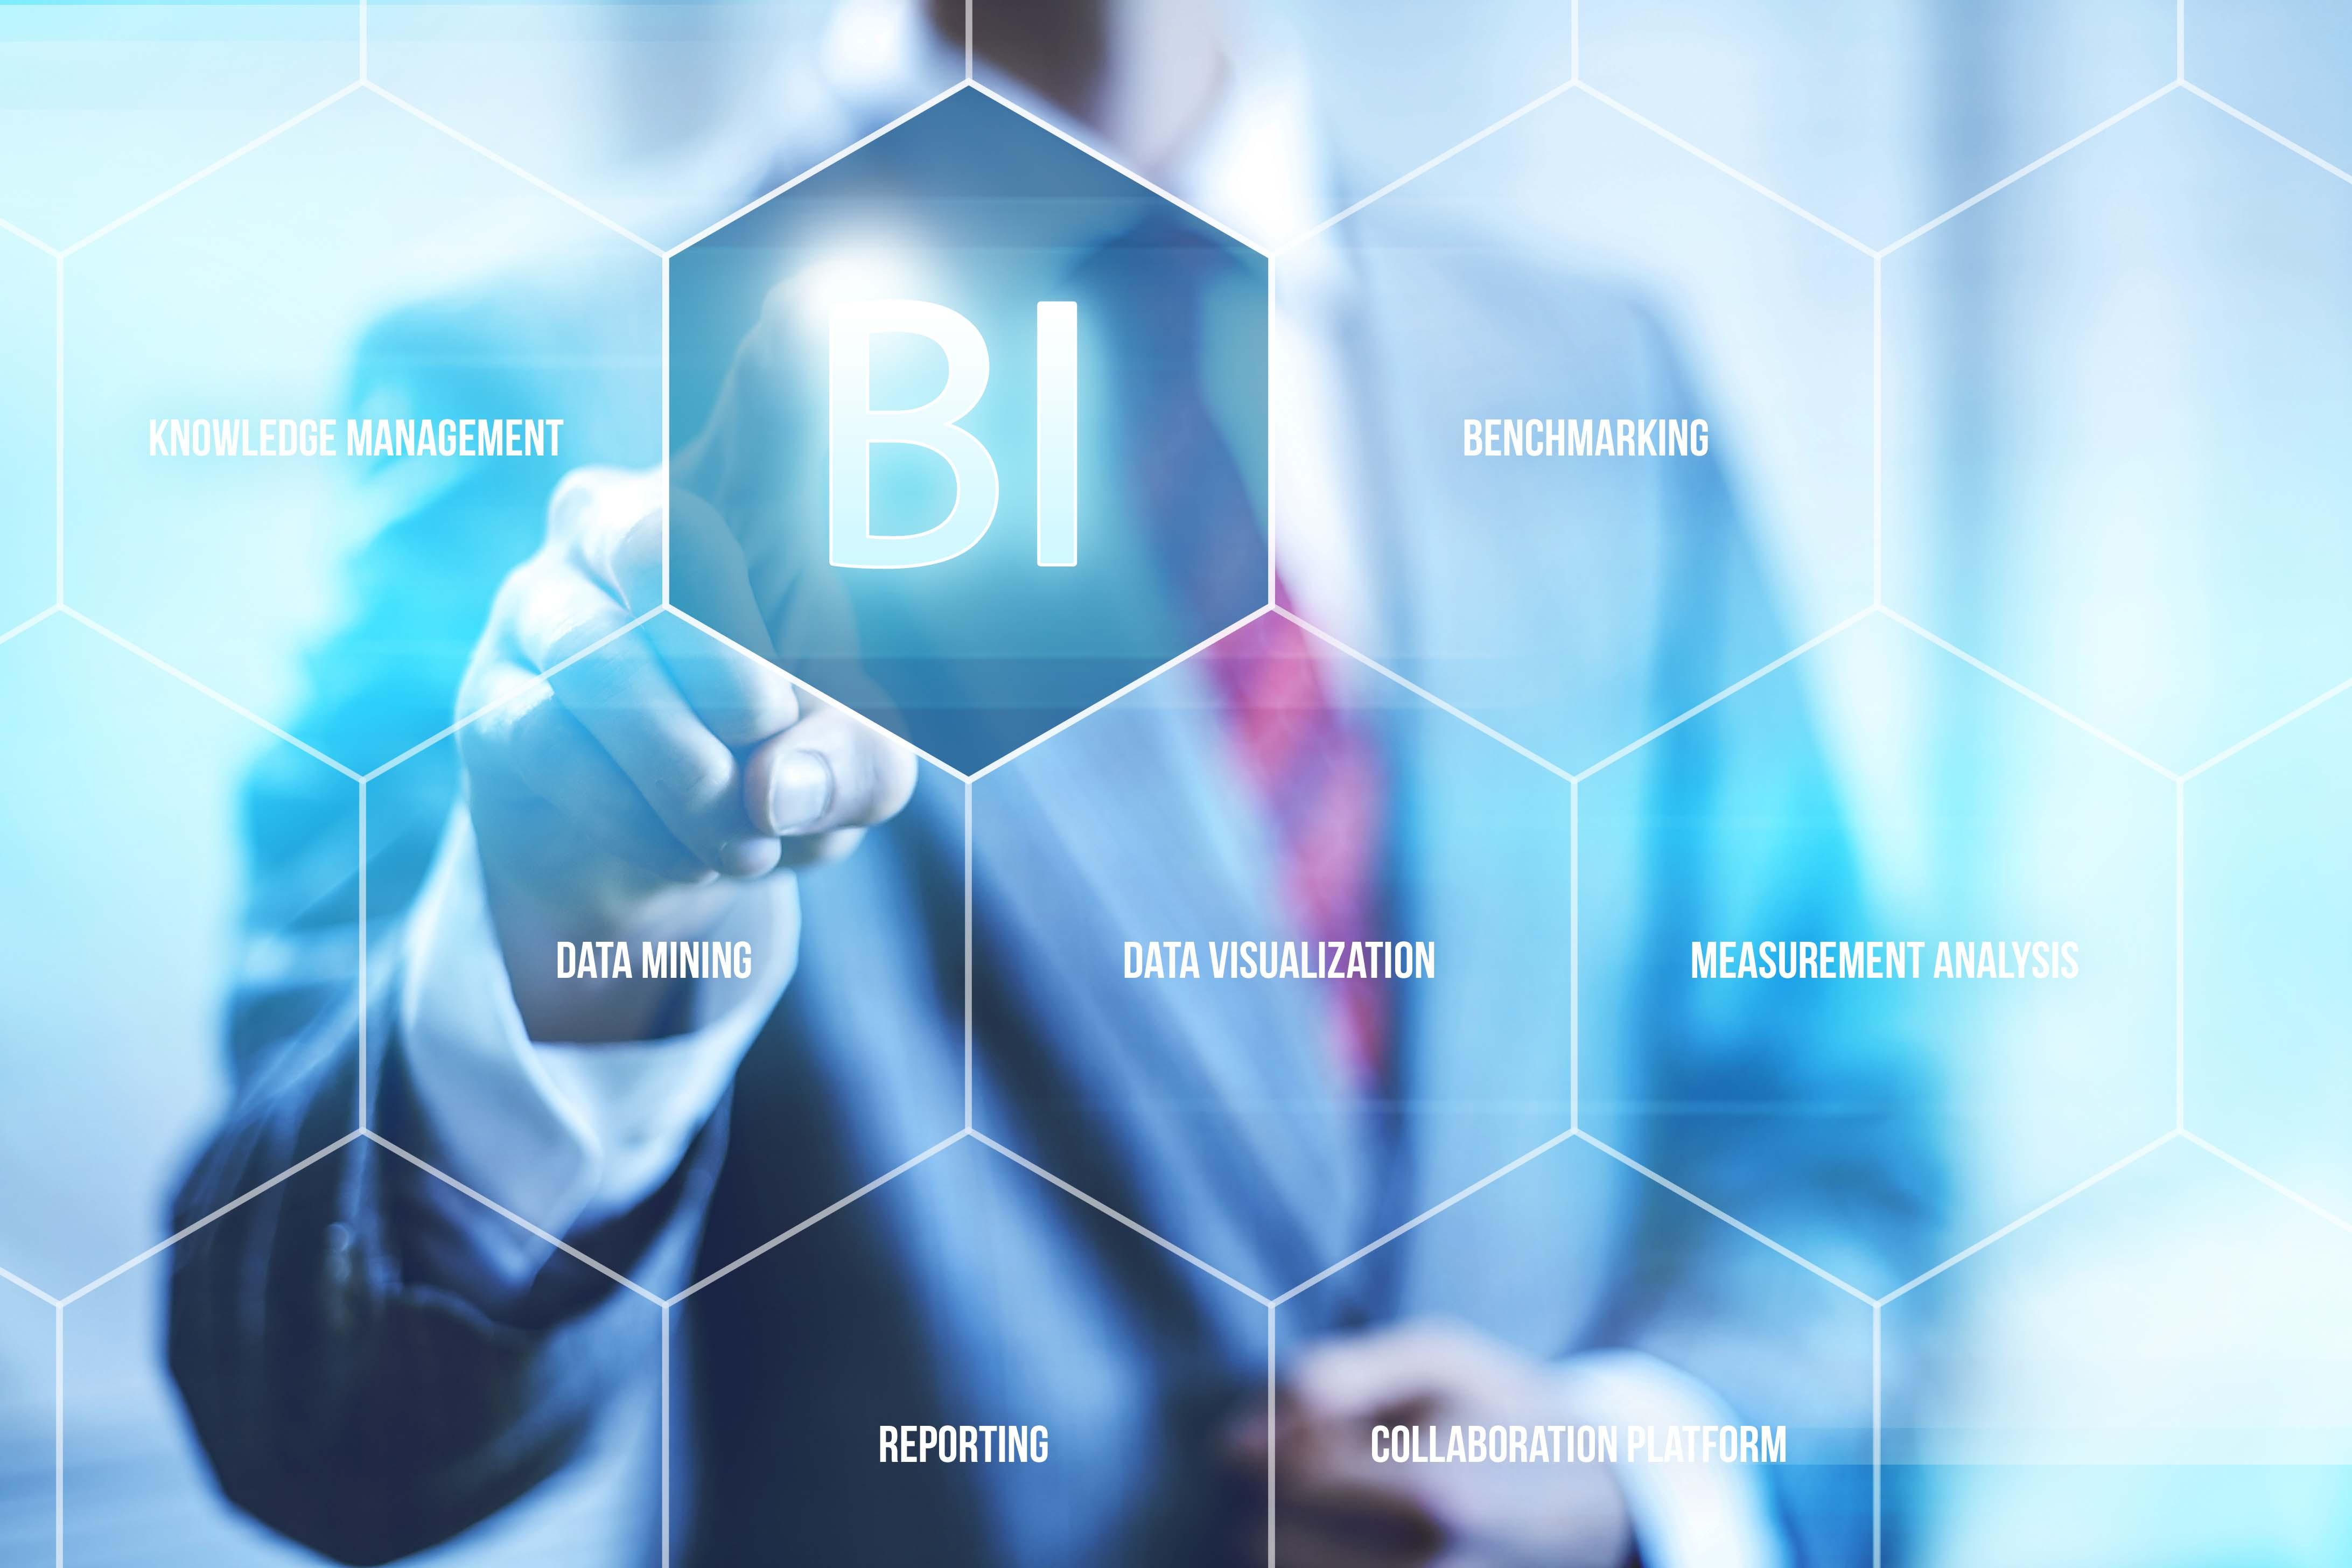 Business Intelligence experts